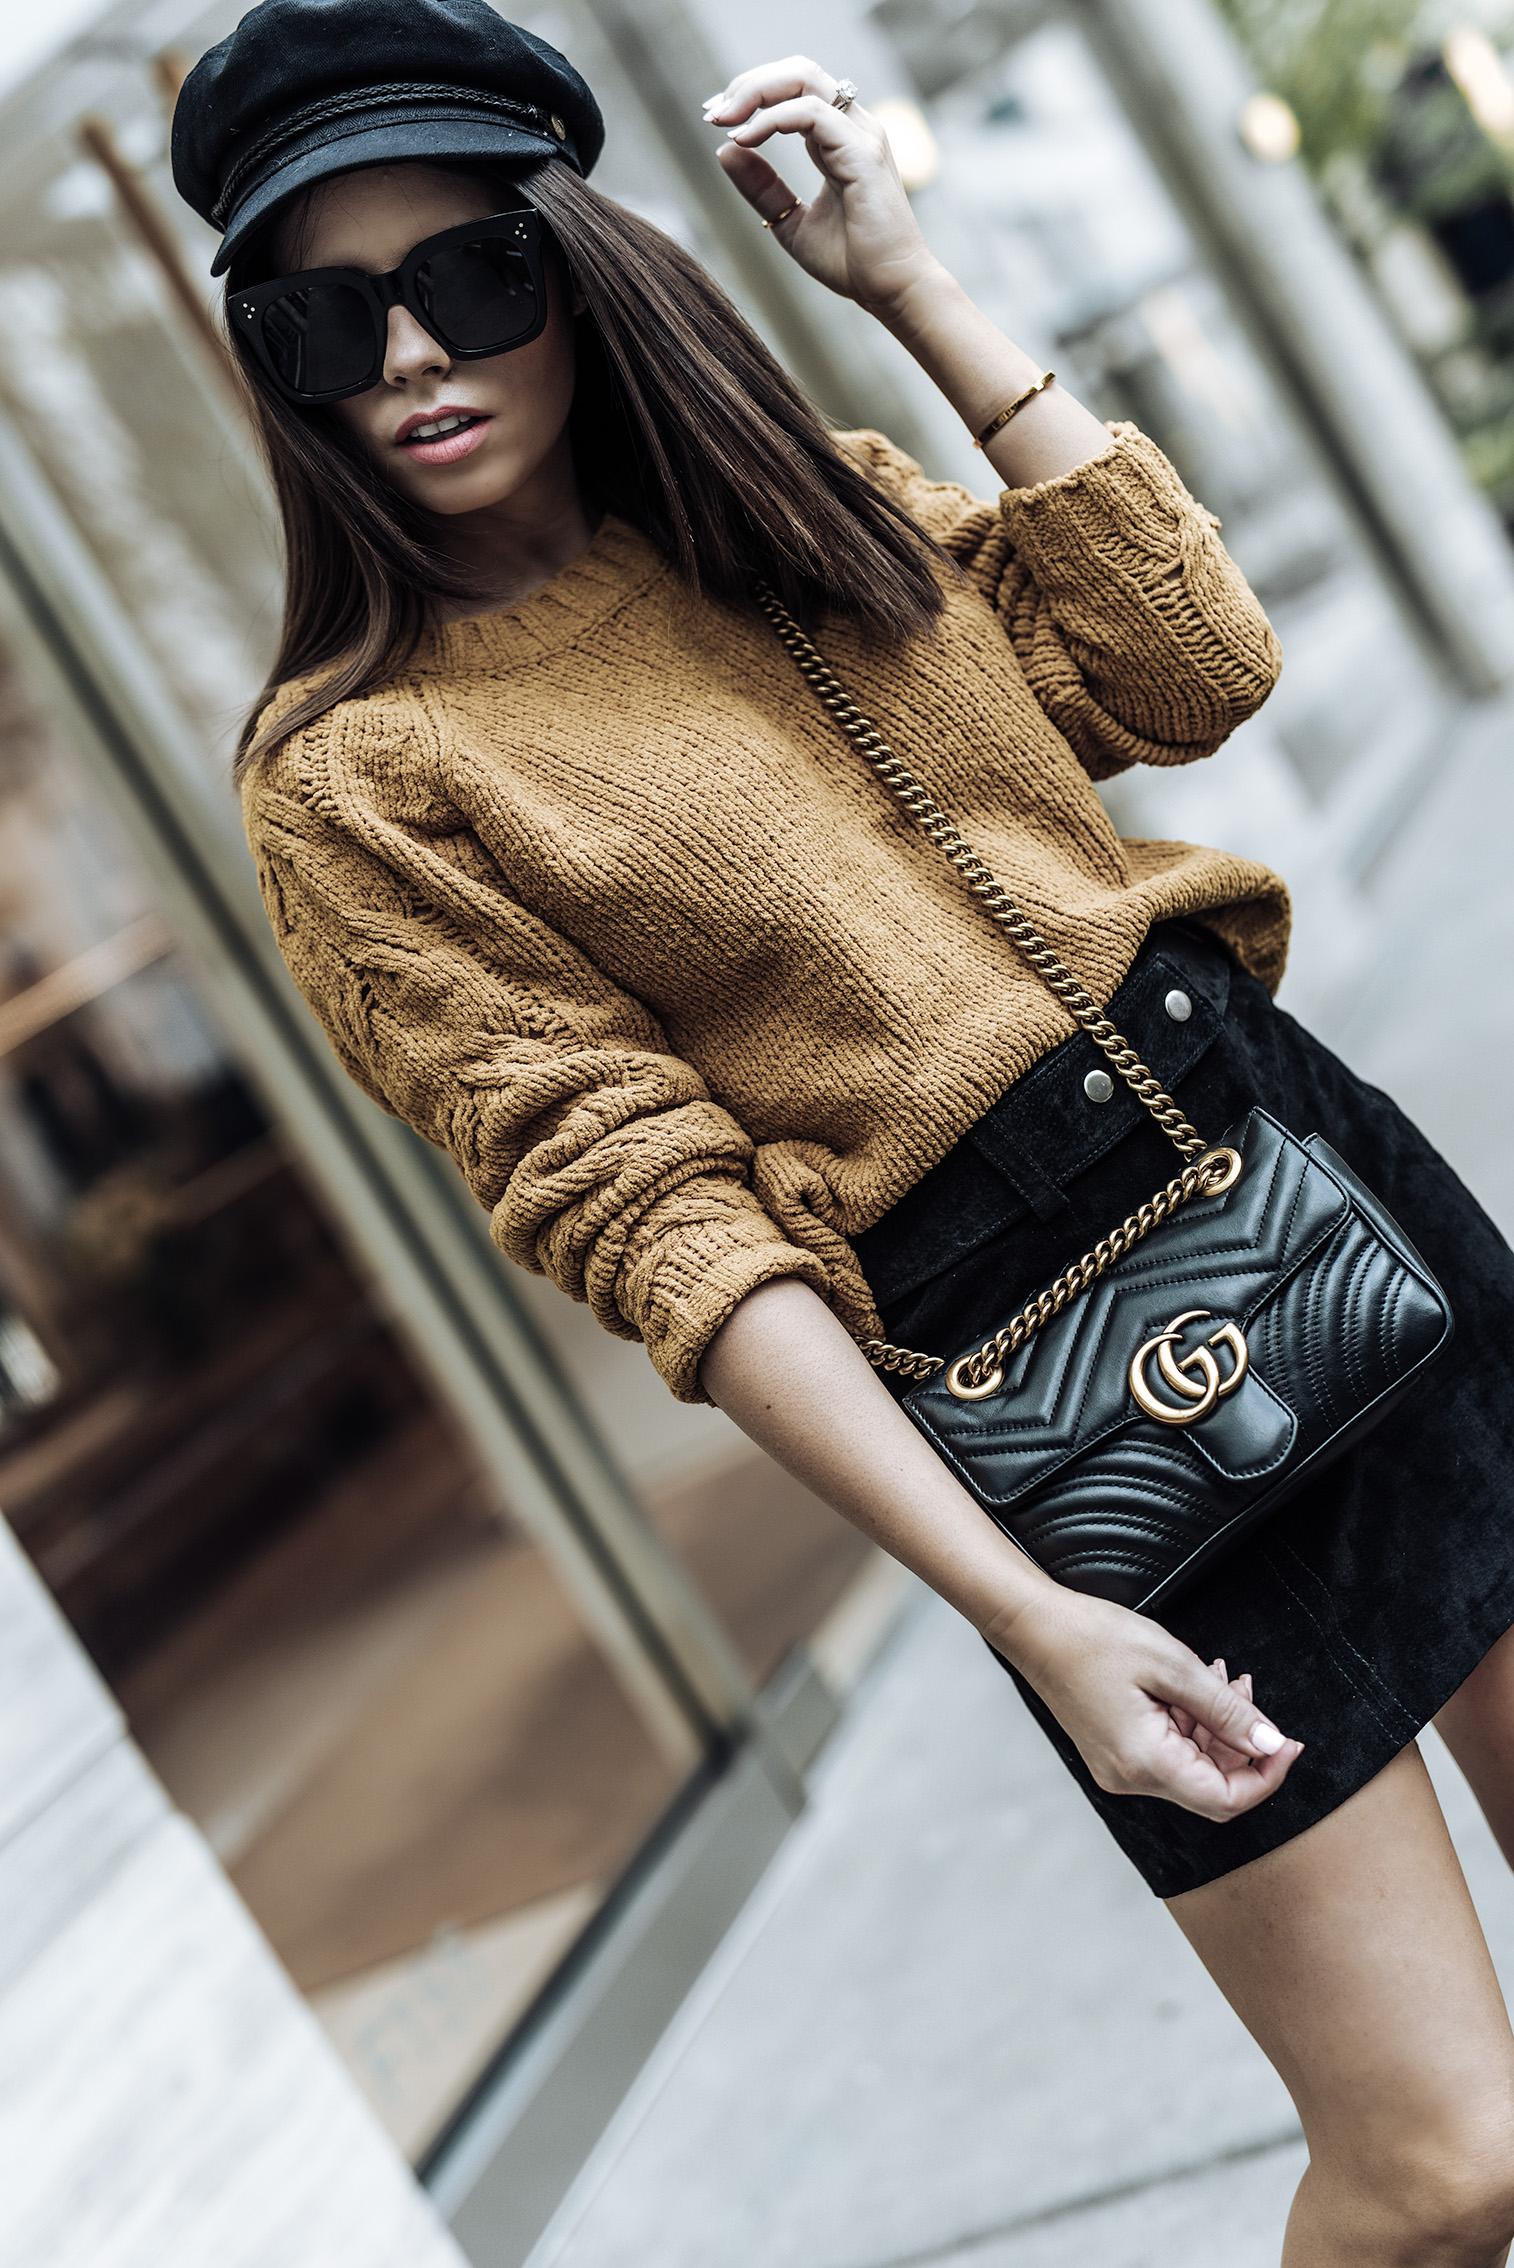 | Fall uniform |ASOS only cable knit sweater | Brixton Fiddler hat| ASOS Ellison zip booties | Suede mini skirt (ZARA, similar here) | Streetstyle blog | Paperboy hat | #falloutfits2017 #paperboyhat #sweateroutfits #streetstyle